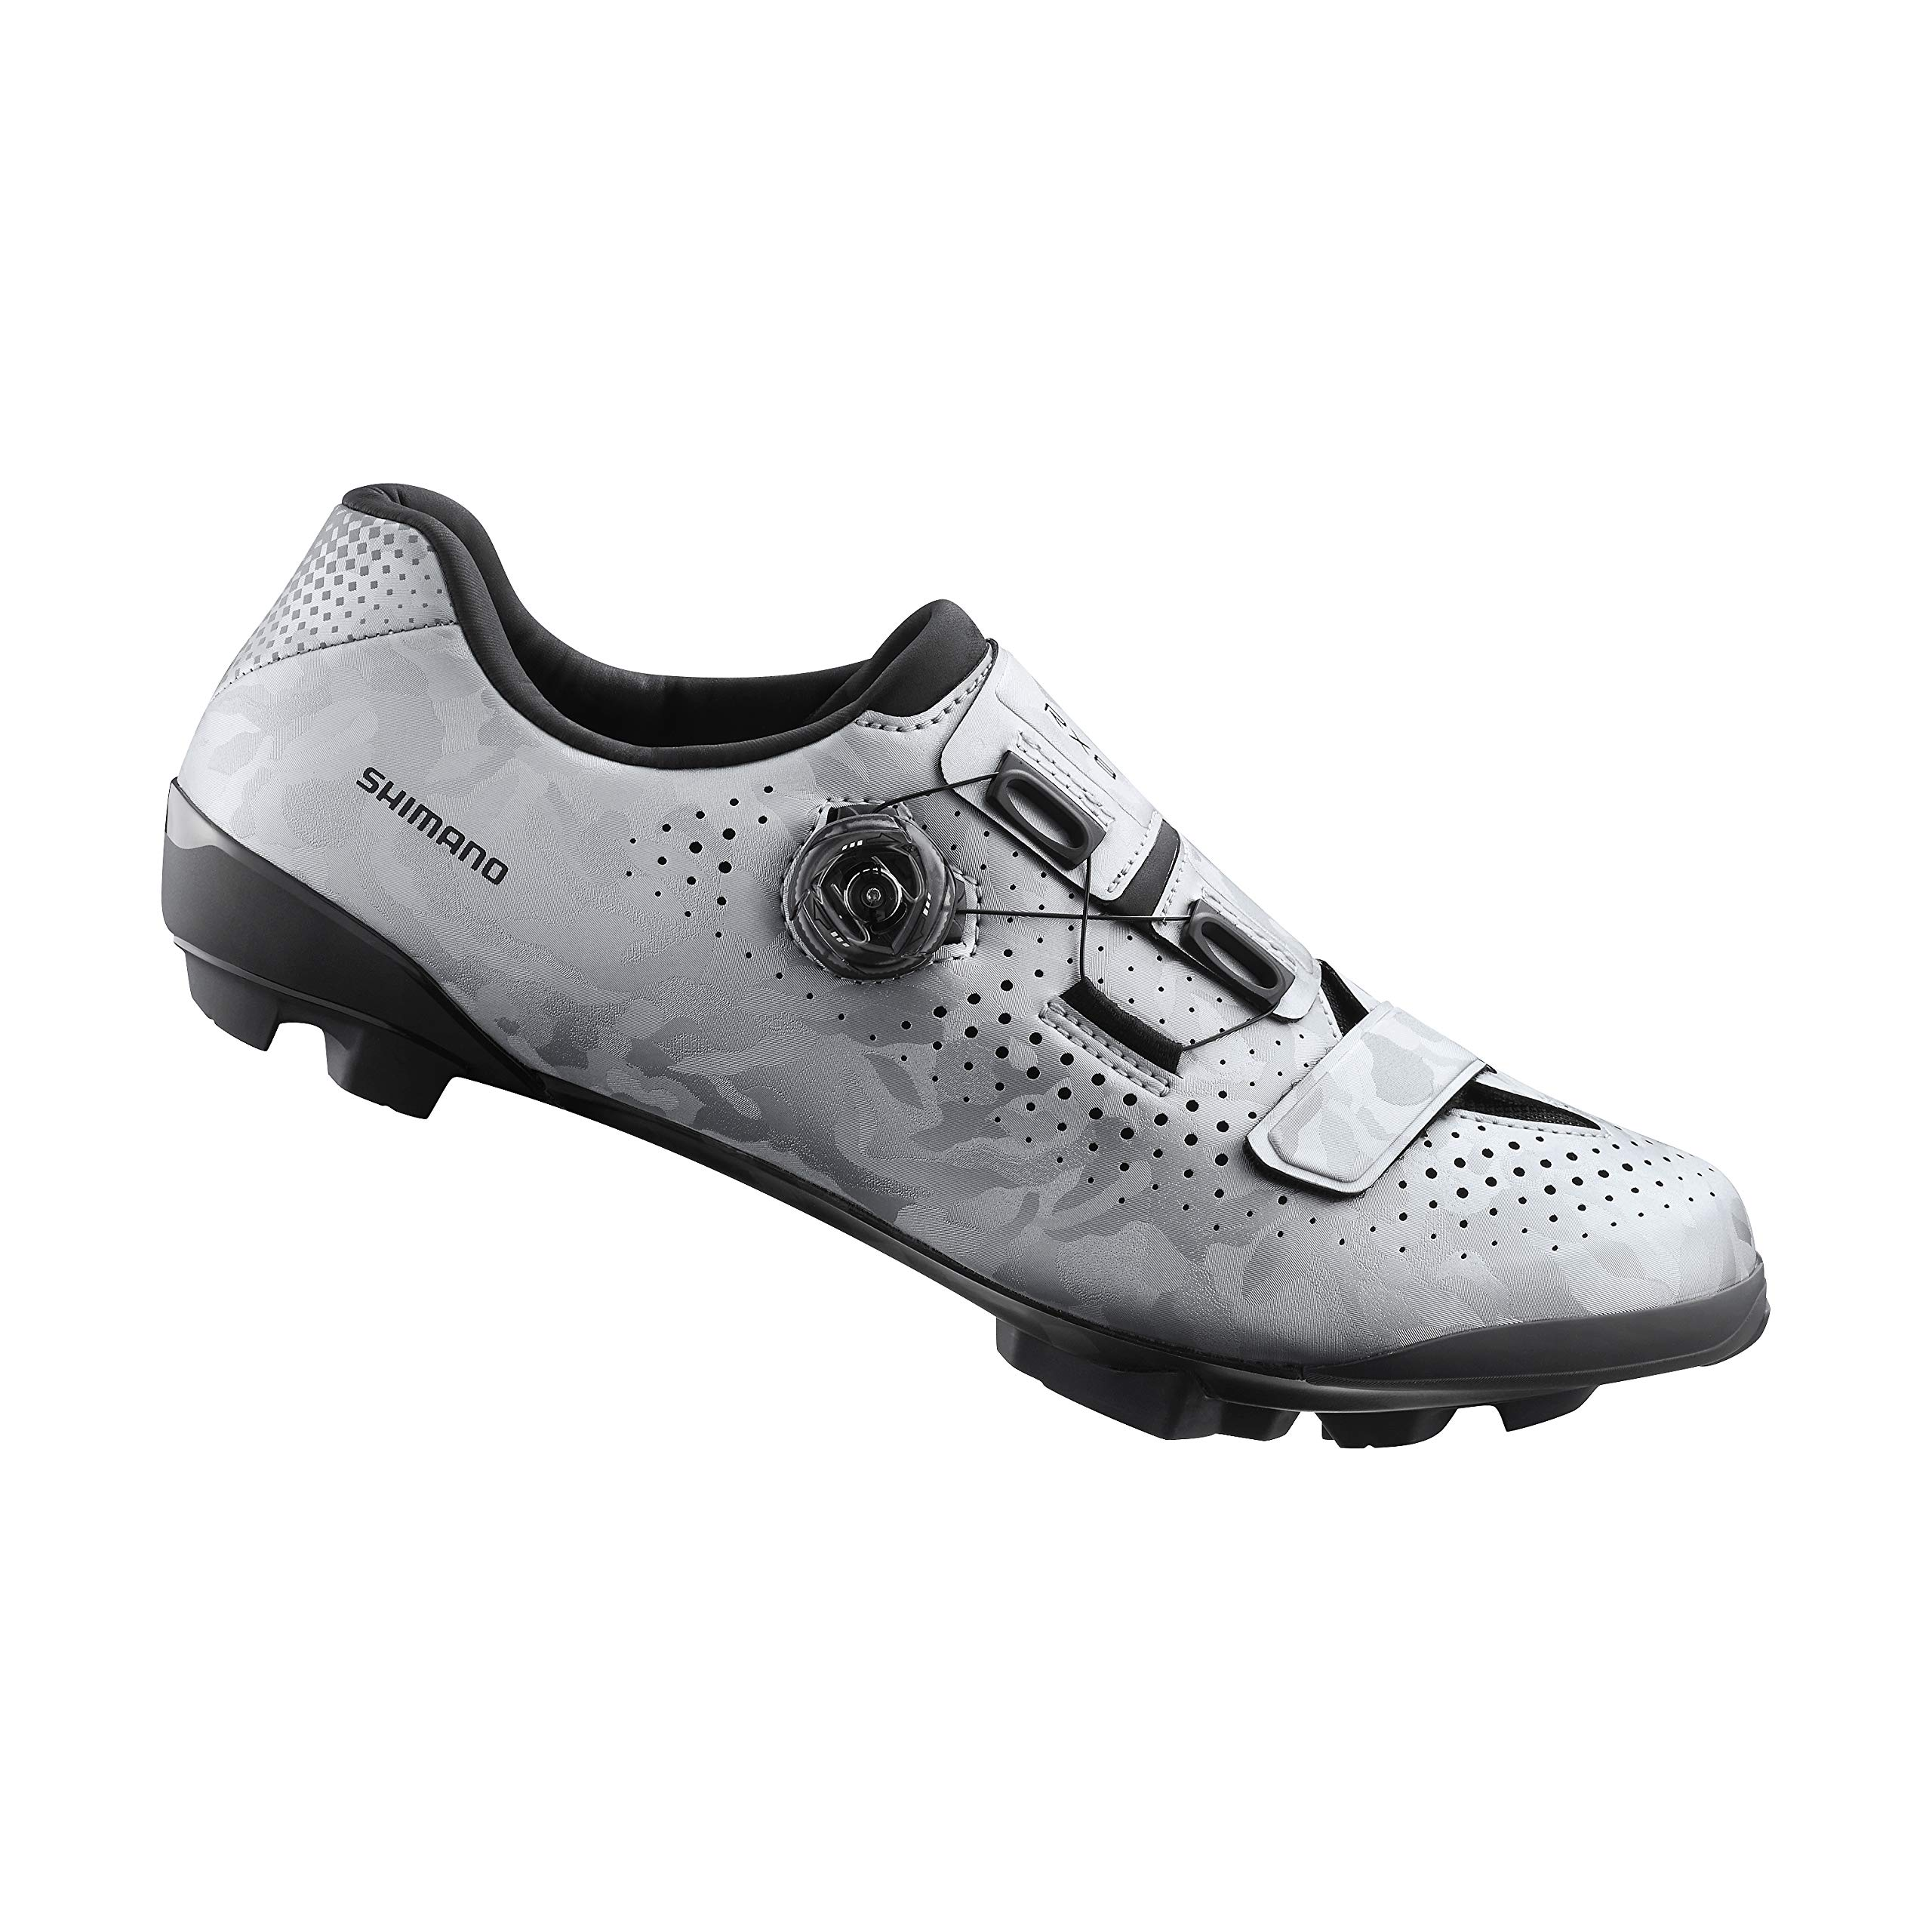 SHIMANO SH-RX800 Bicycles Shoes, Silver, 44.0 by SHIMANO